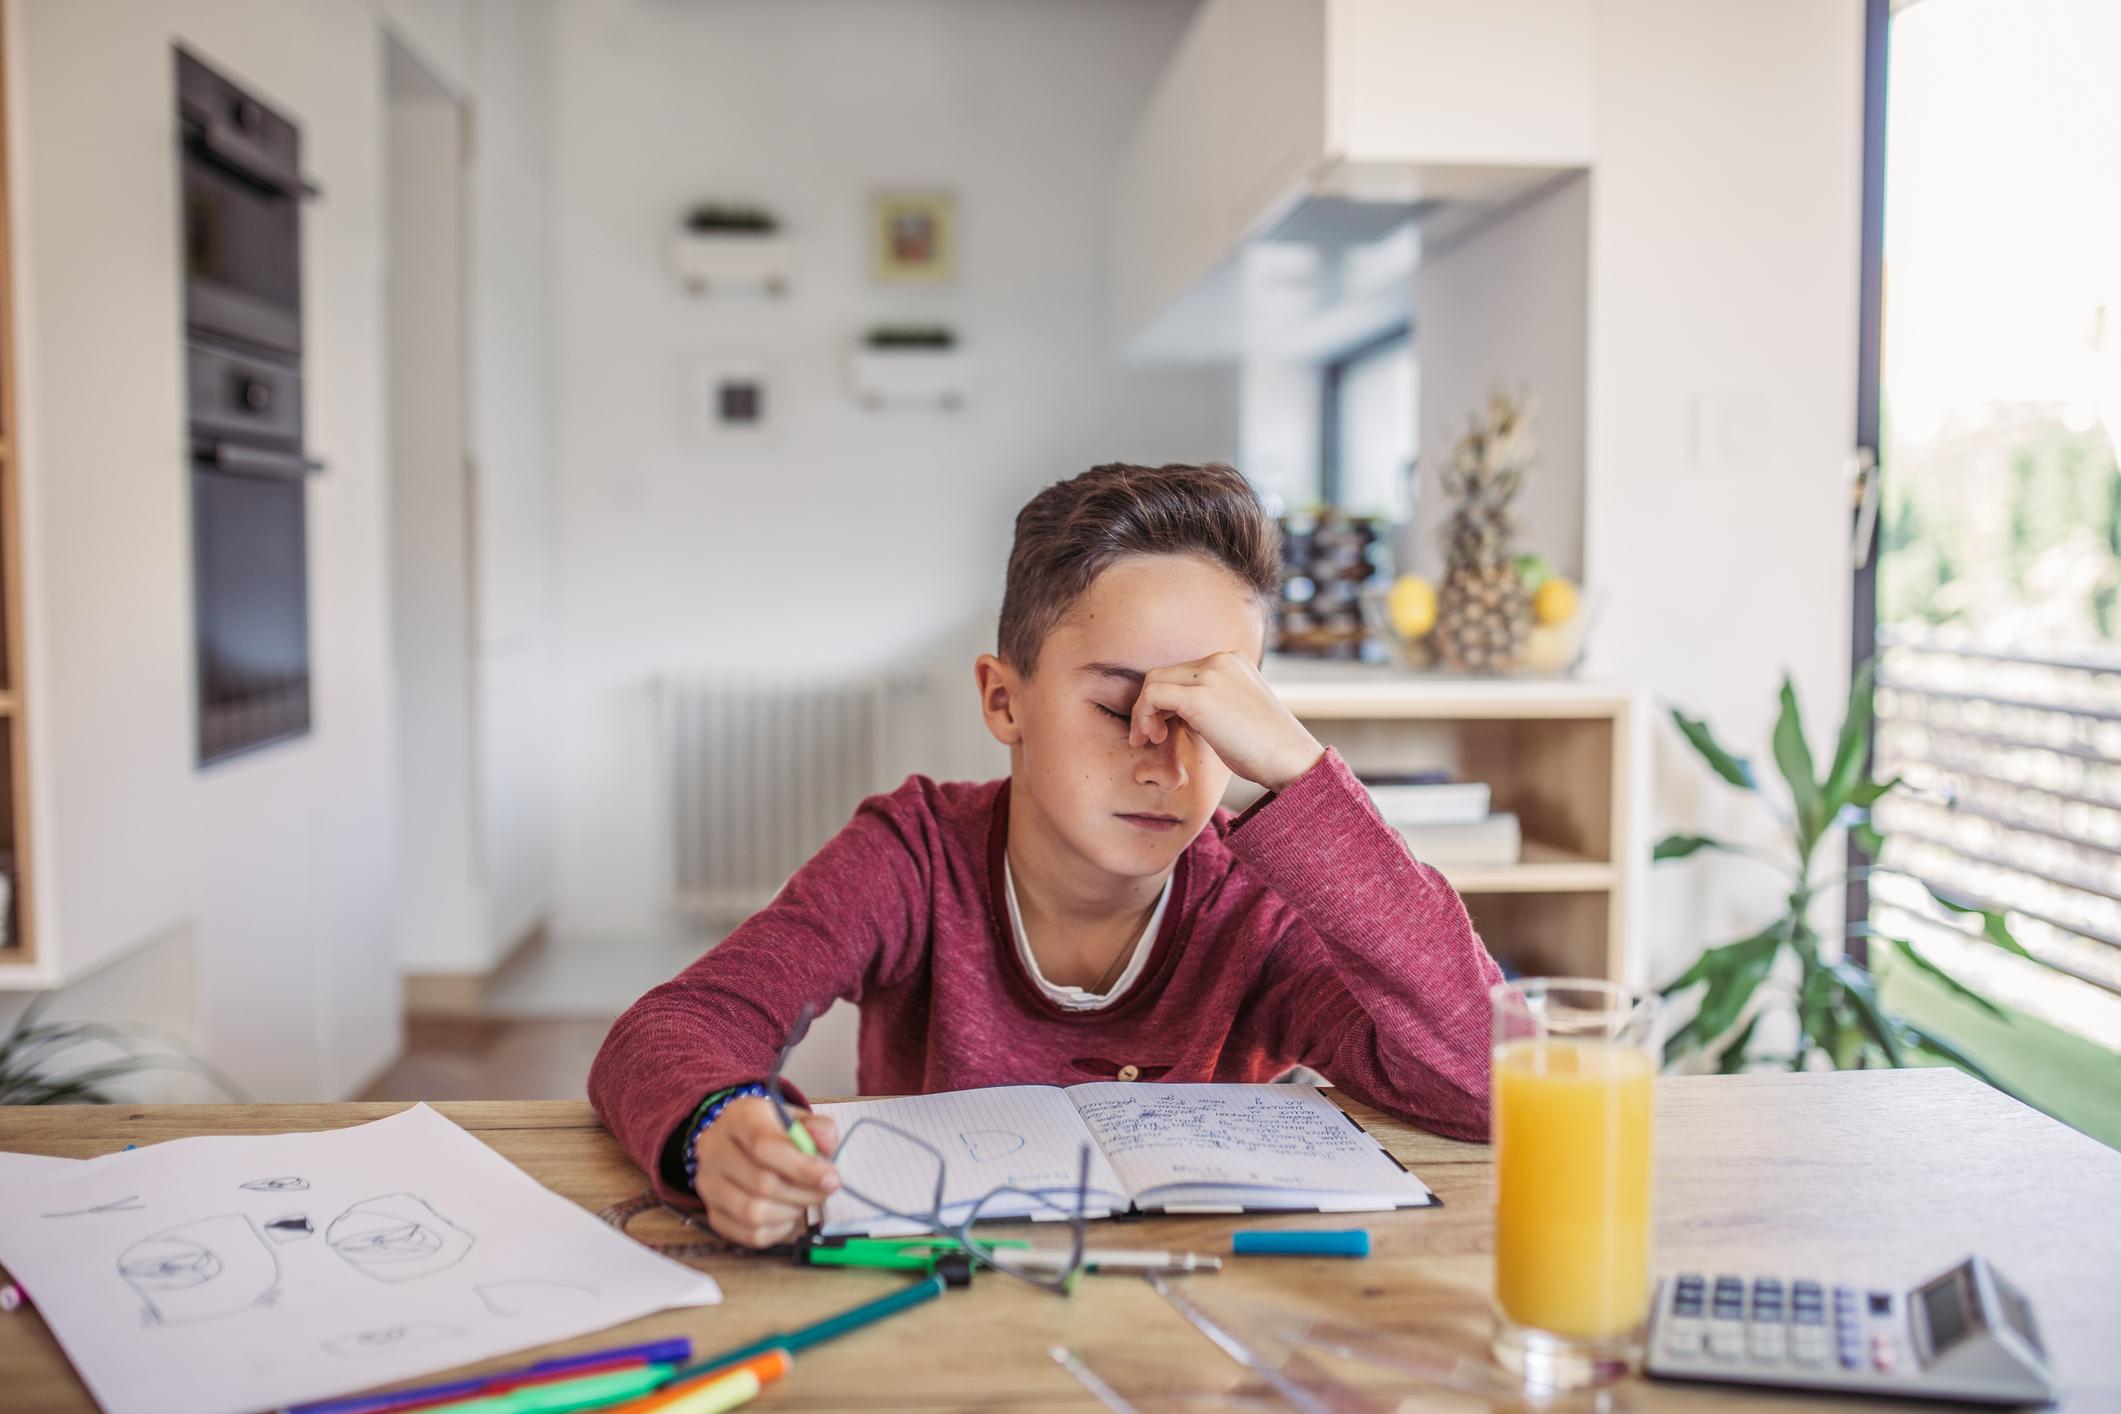 Niño preocupado por estudio